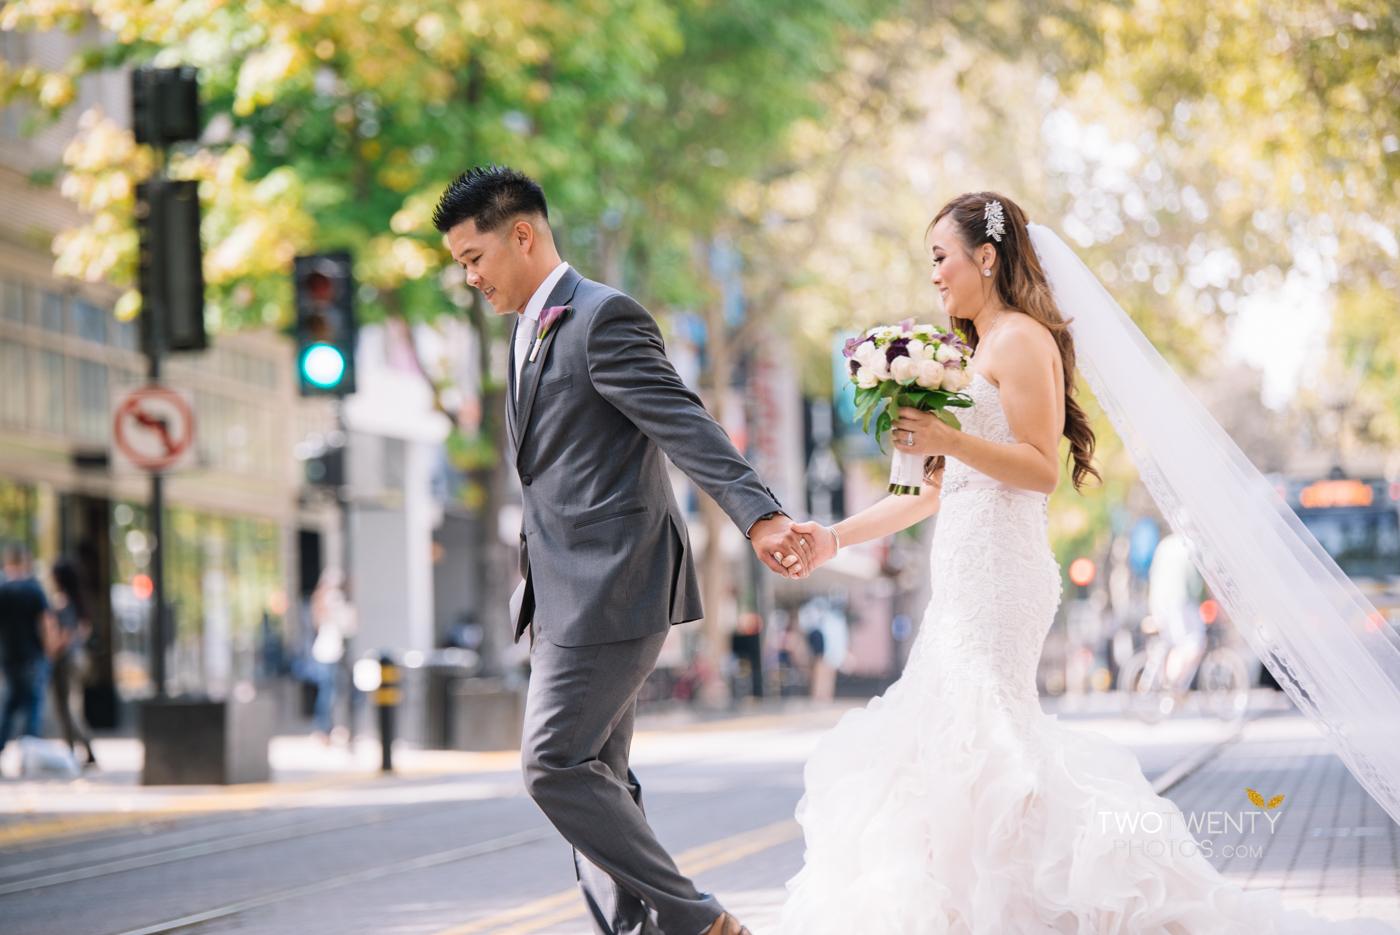 the-kay-ca-state-capital-downtown-sacramento-wedding-photographer-2